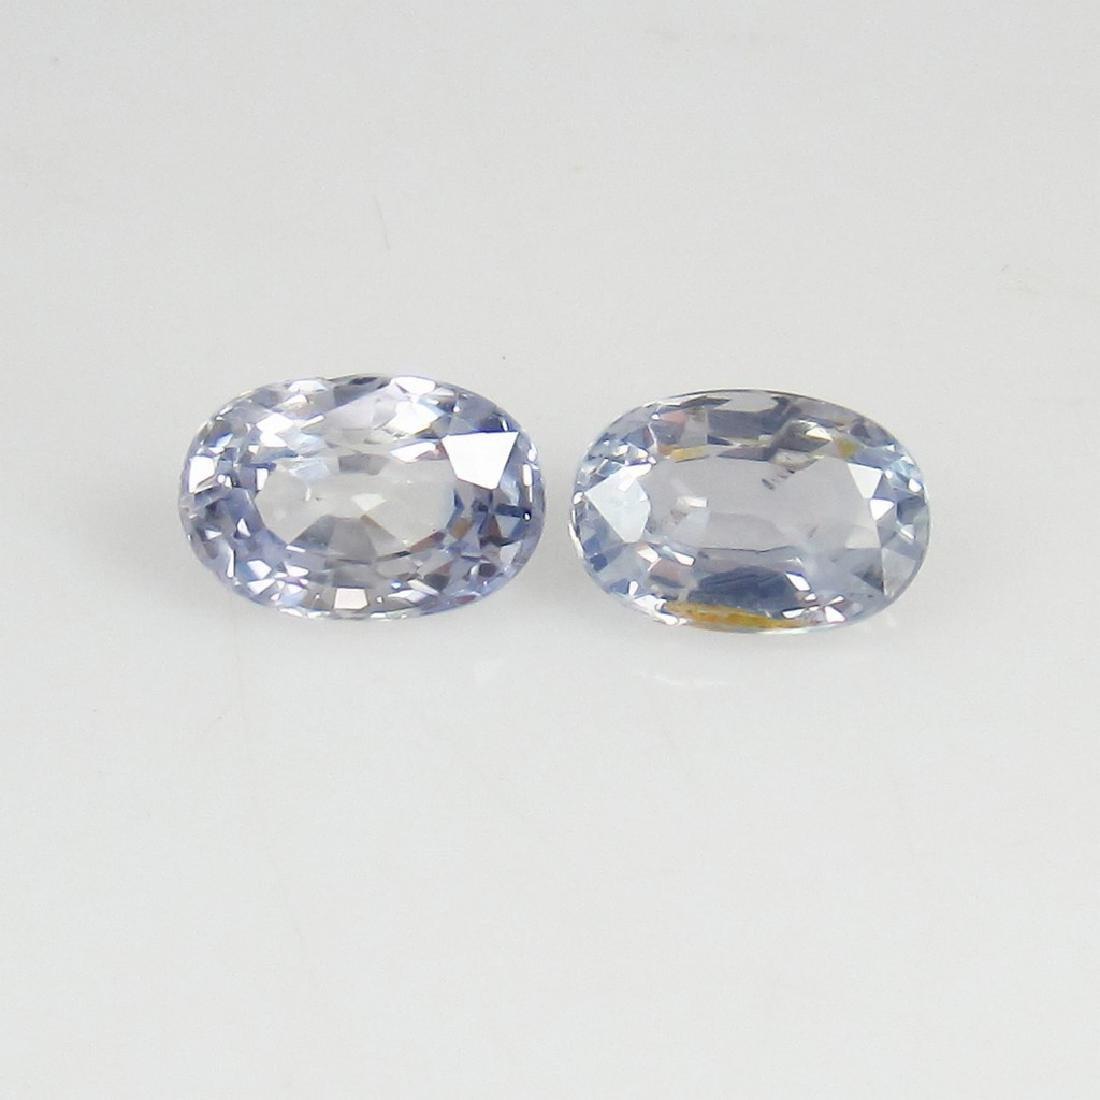 1.52 Ct Genuine Ceylon Very Light Blue Sapphire Oval